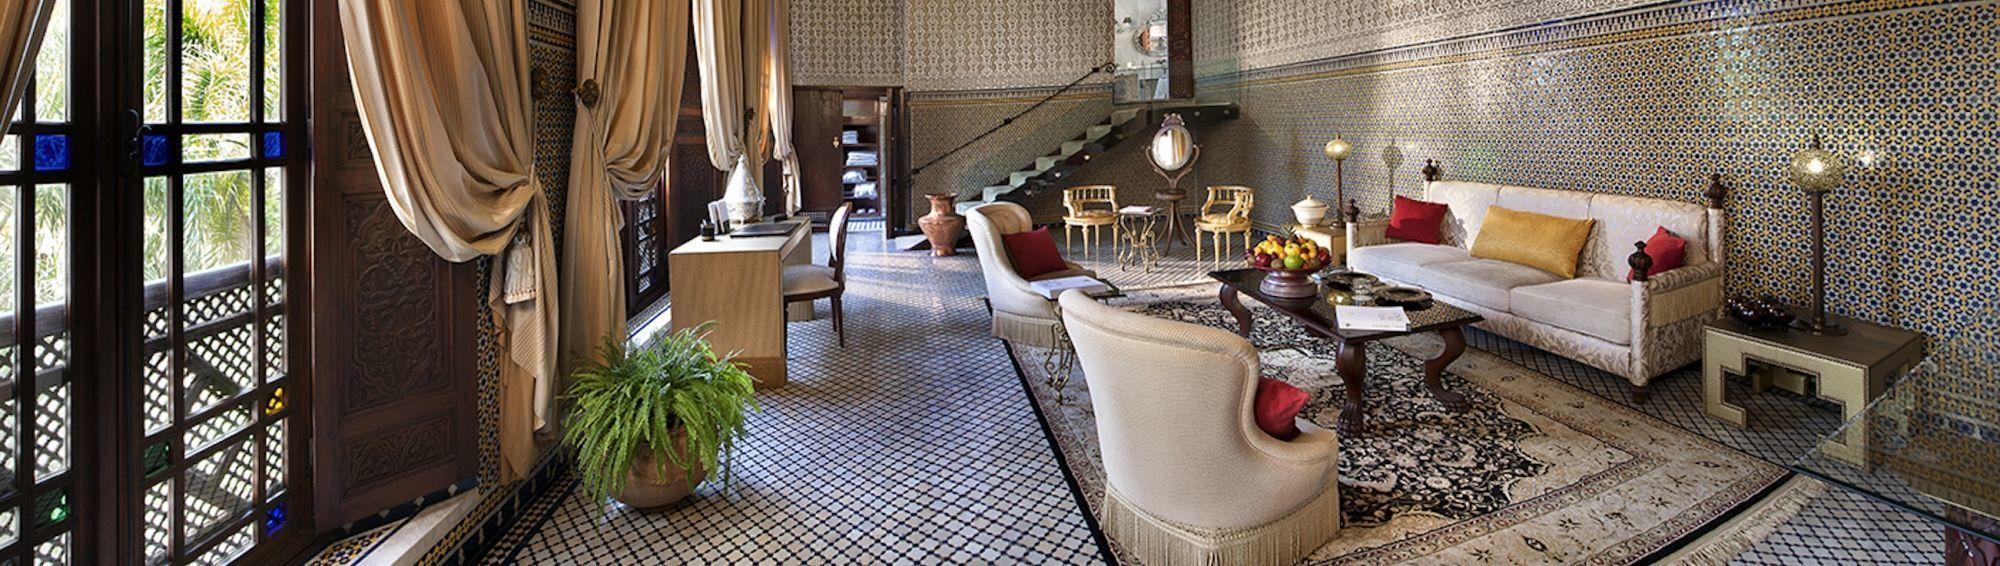 Riad Fes Hotel - Royal Suite